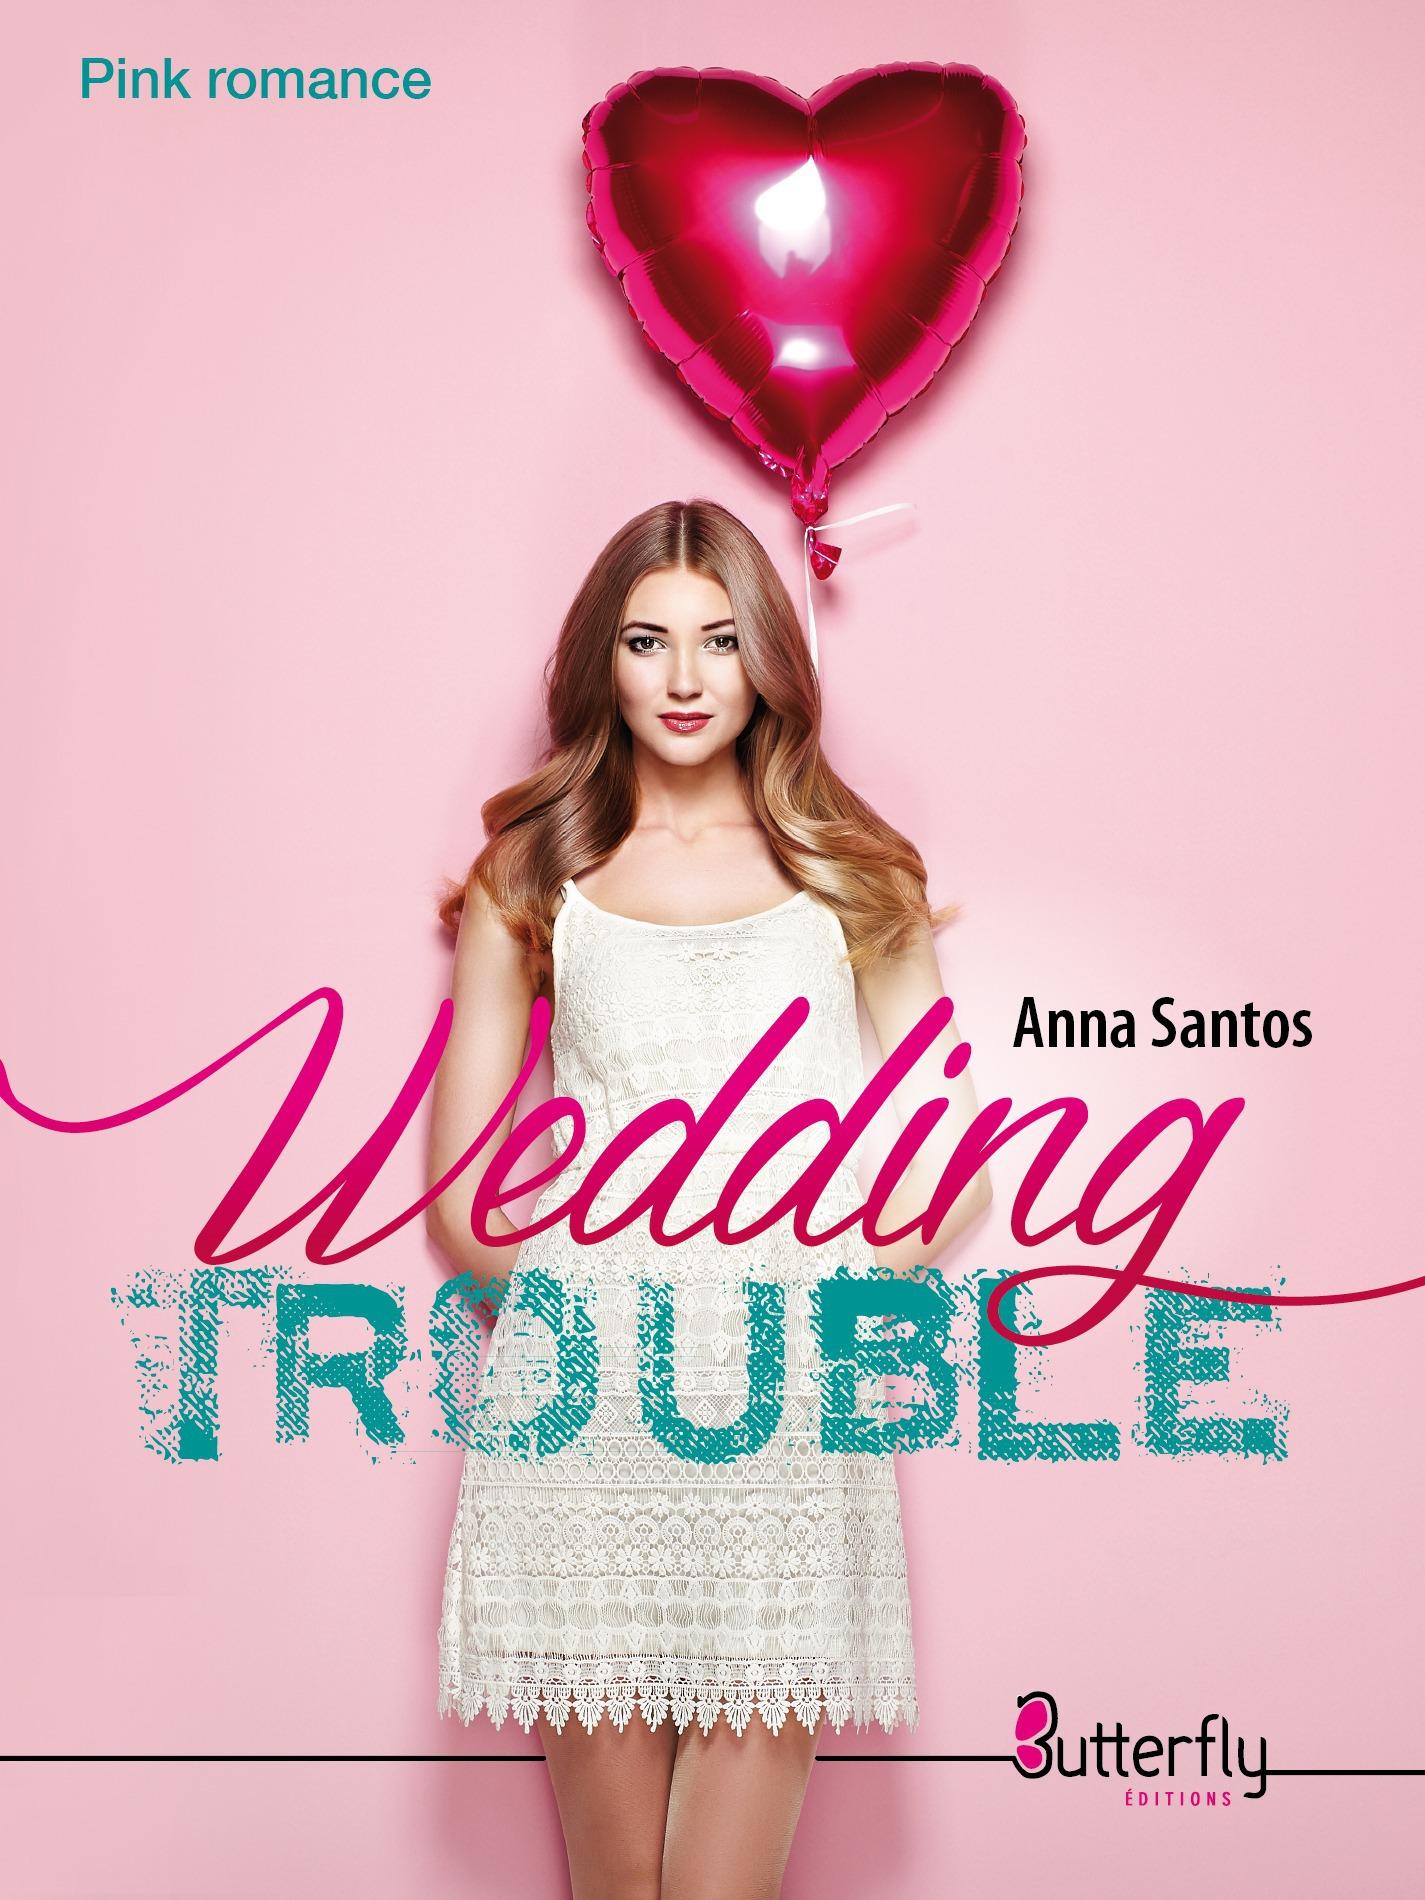 Wedding trouble